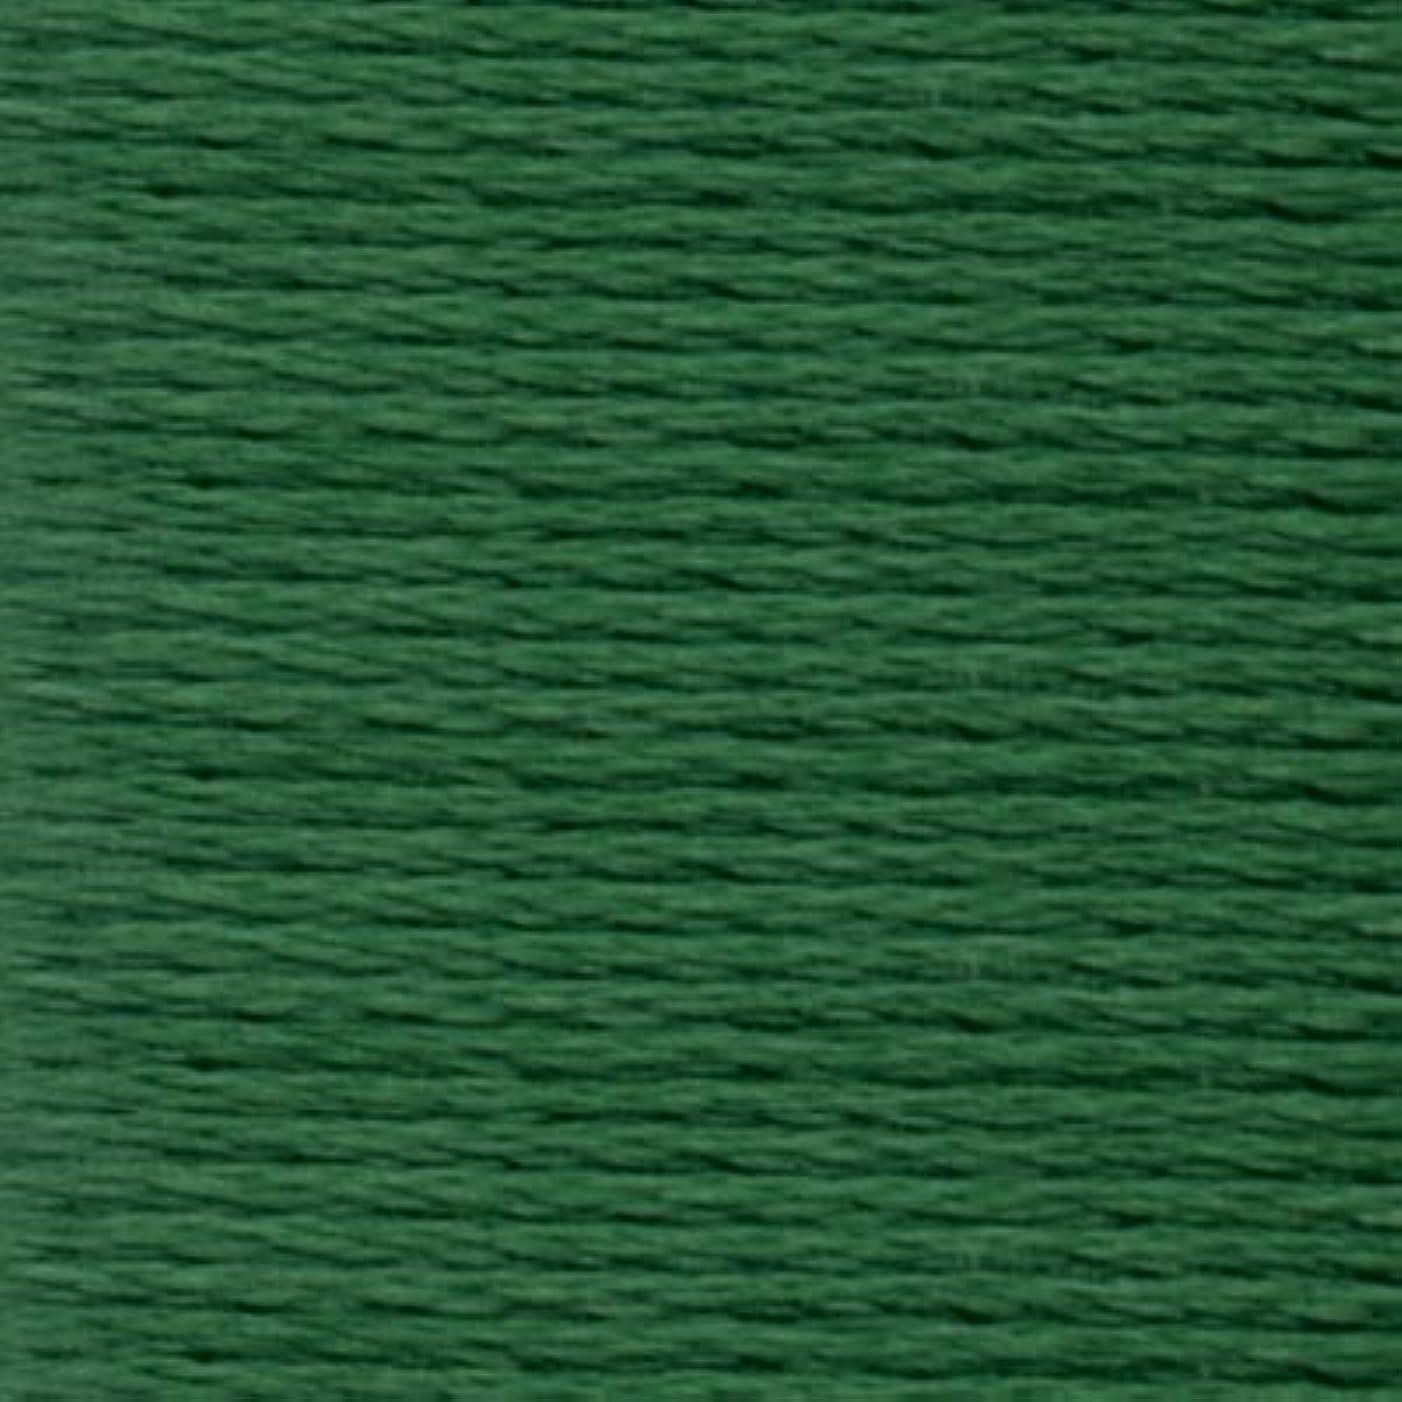 Anchor Six Strand Embroidery Floss 8.75 Yards-Juniper Medium Dark 12 per Box